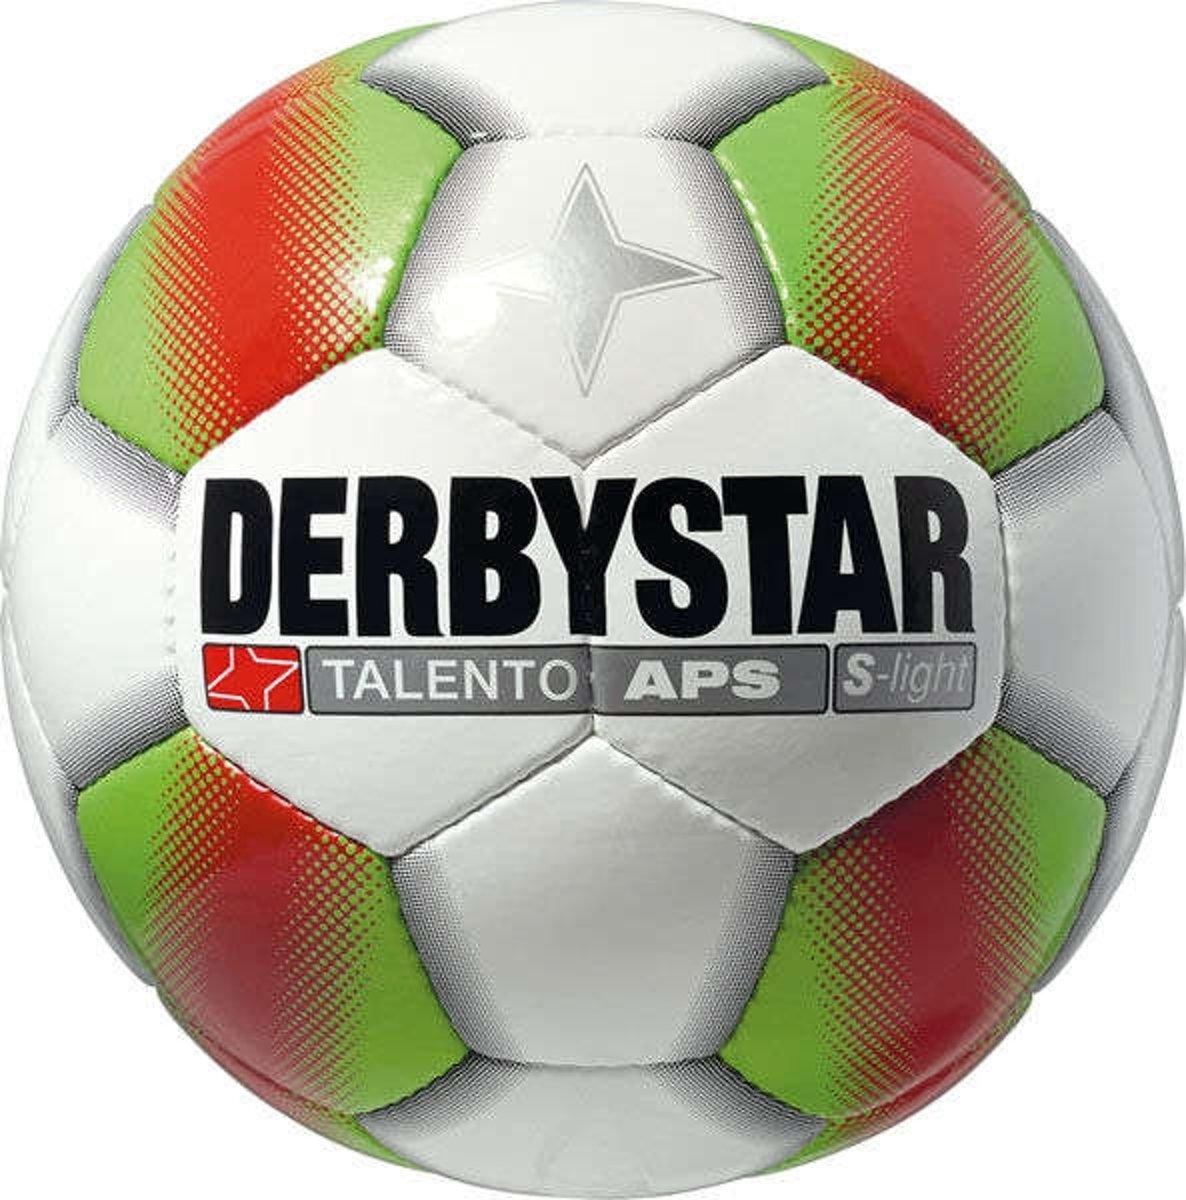 Derbystar Voetbal Talento APS S-Light Wedstrijdbal